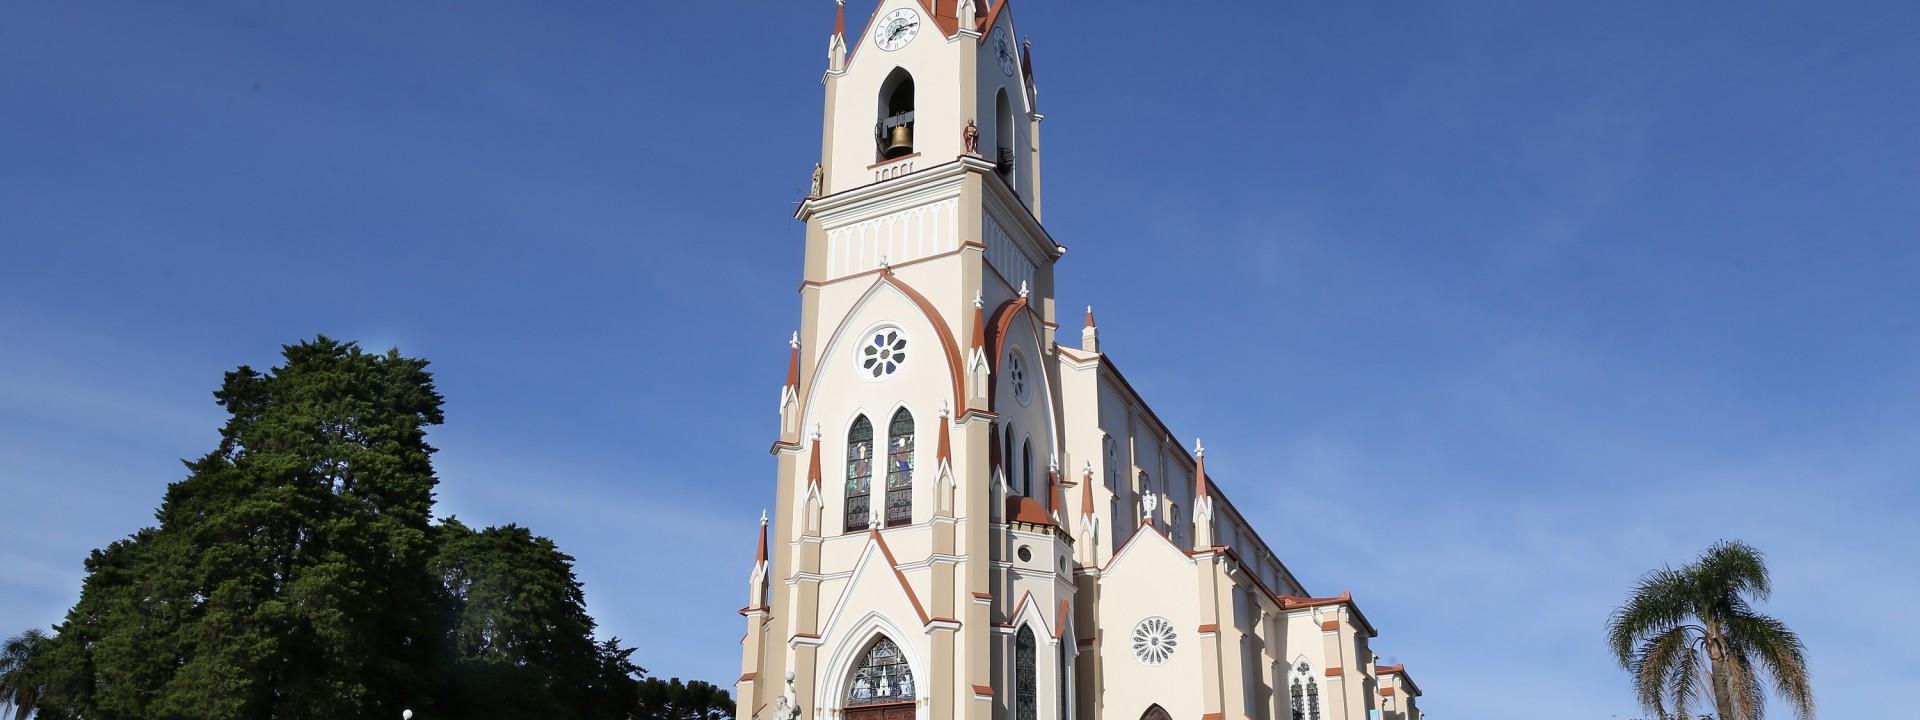 paroquia-sao-pedro-de-garibaldi-conclui-obra-de-restauro-da-igreja-matriz_10_3335.jpg